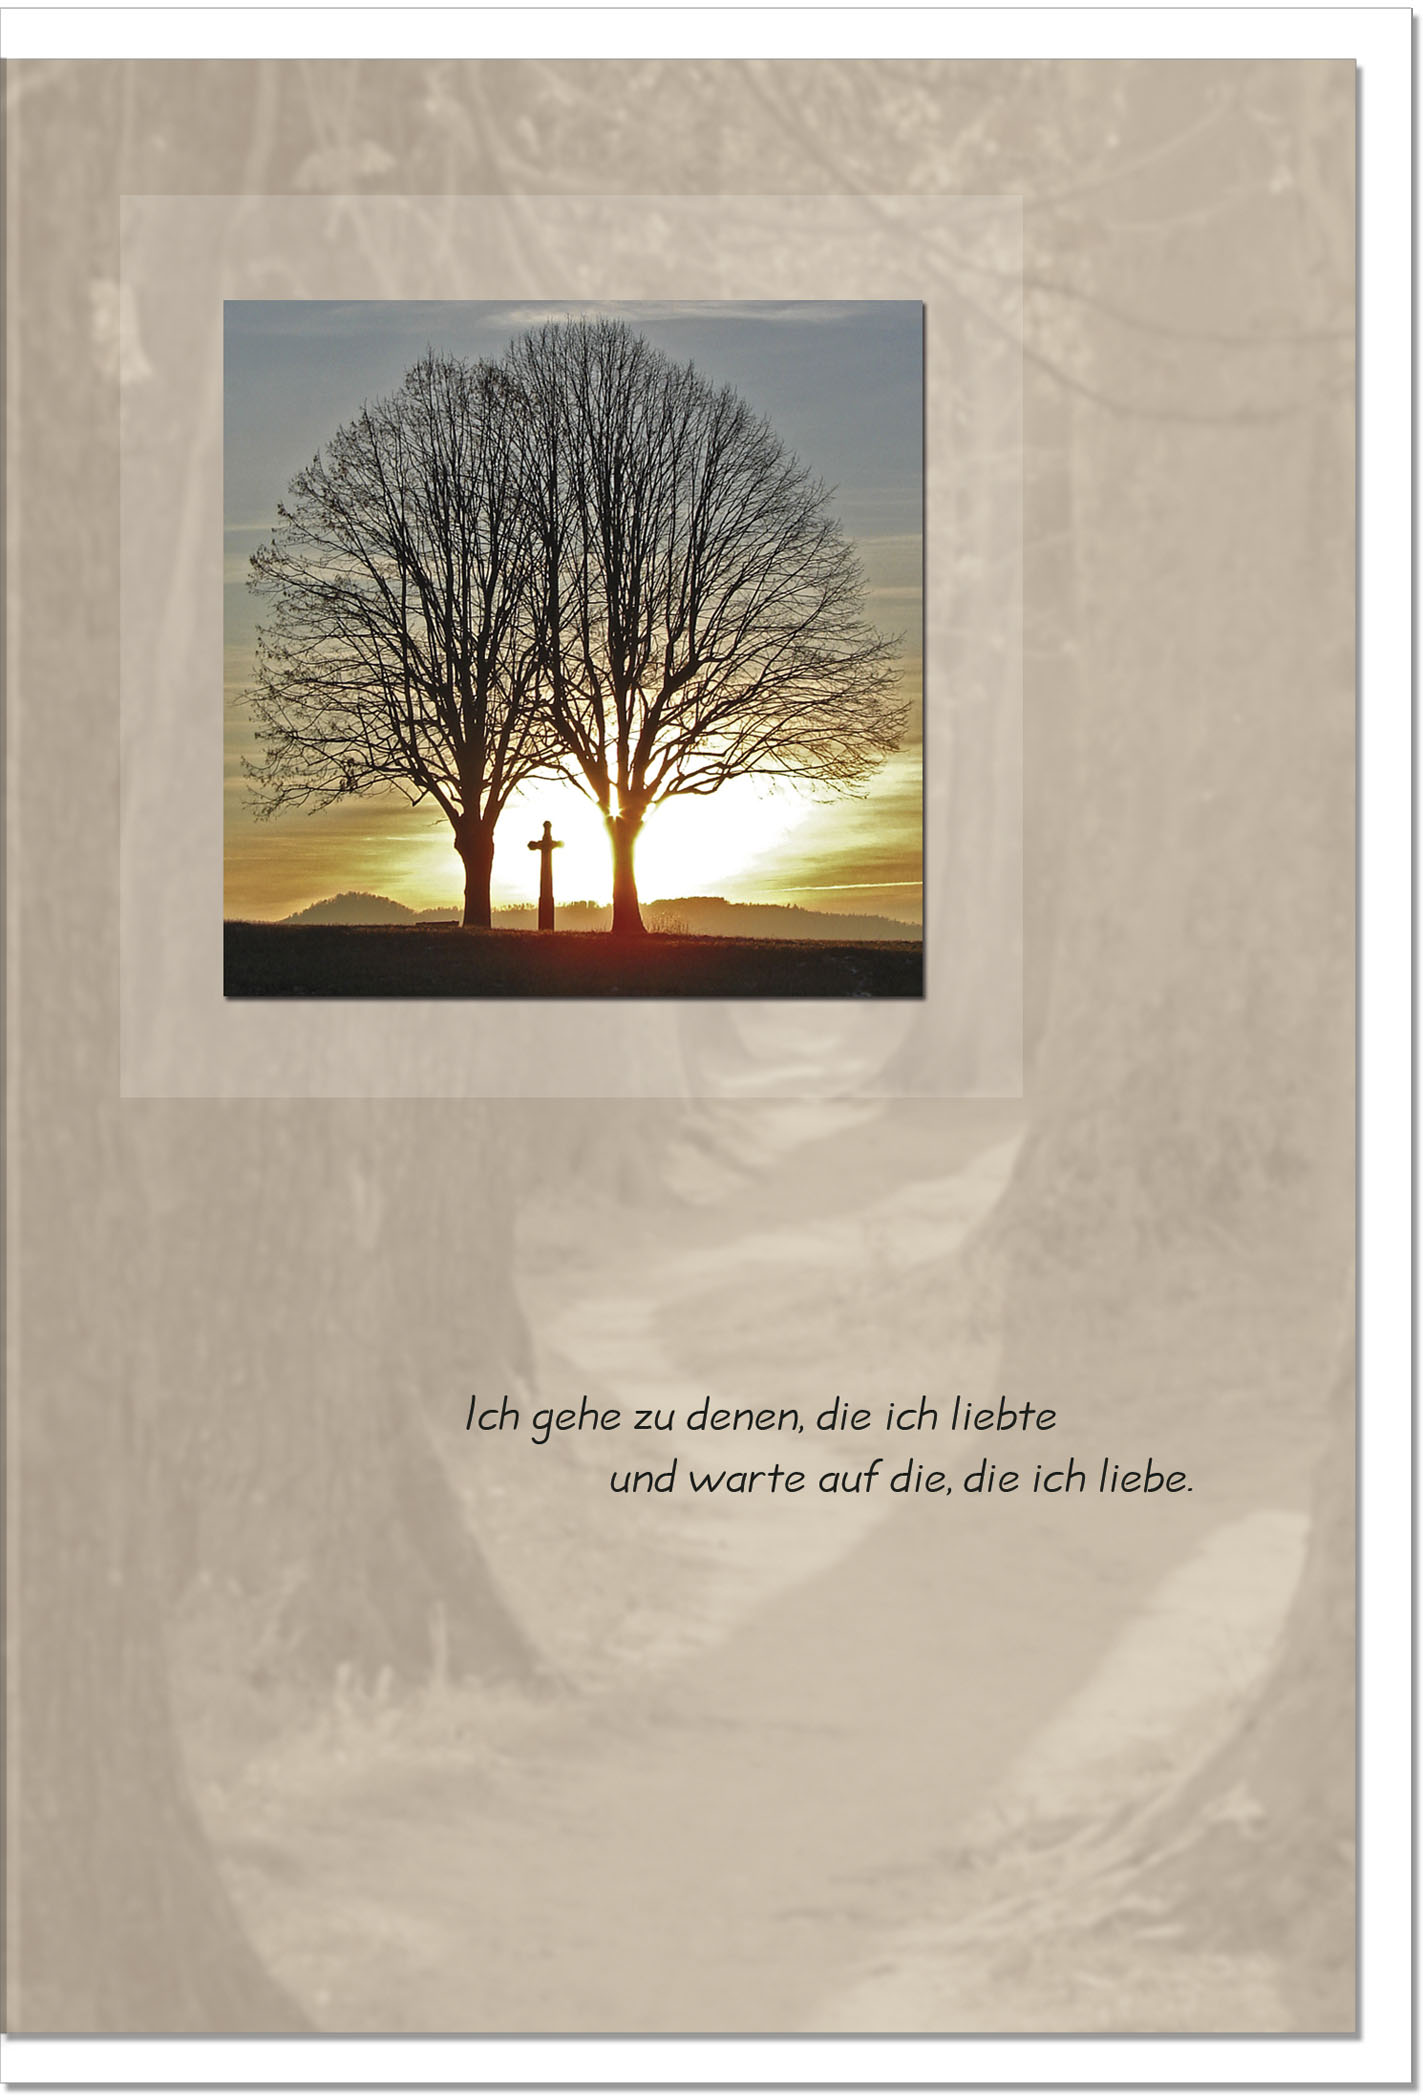 Trauerkarte ABSCHIED | Kreuz im Sonnenuntergang | metALUm #00017